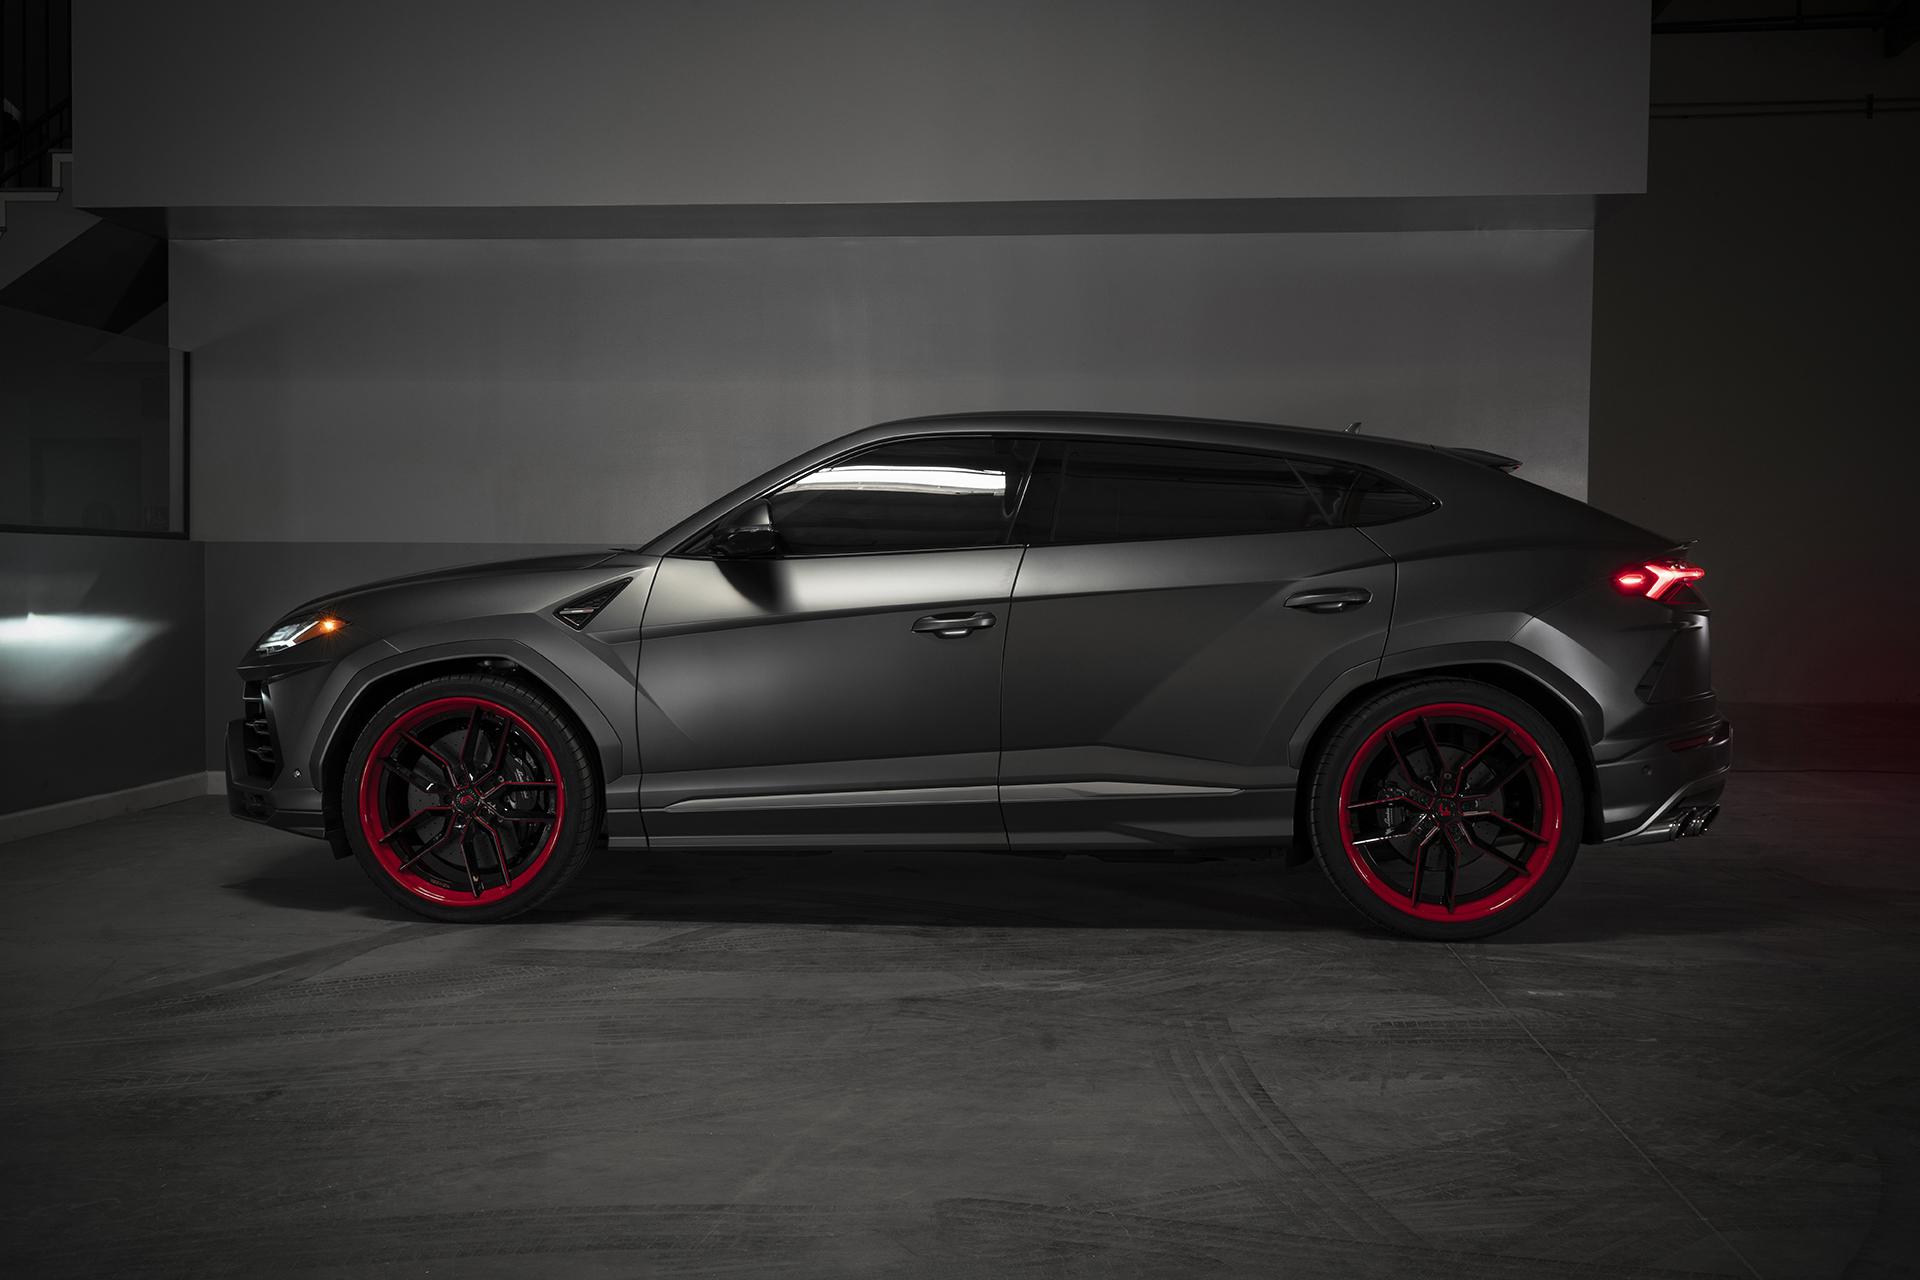 2019 Lamborghini Urus On 24 Inch Forgiato Wheels